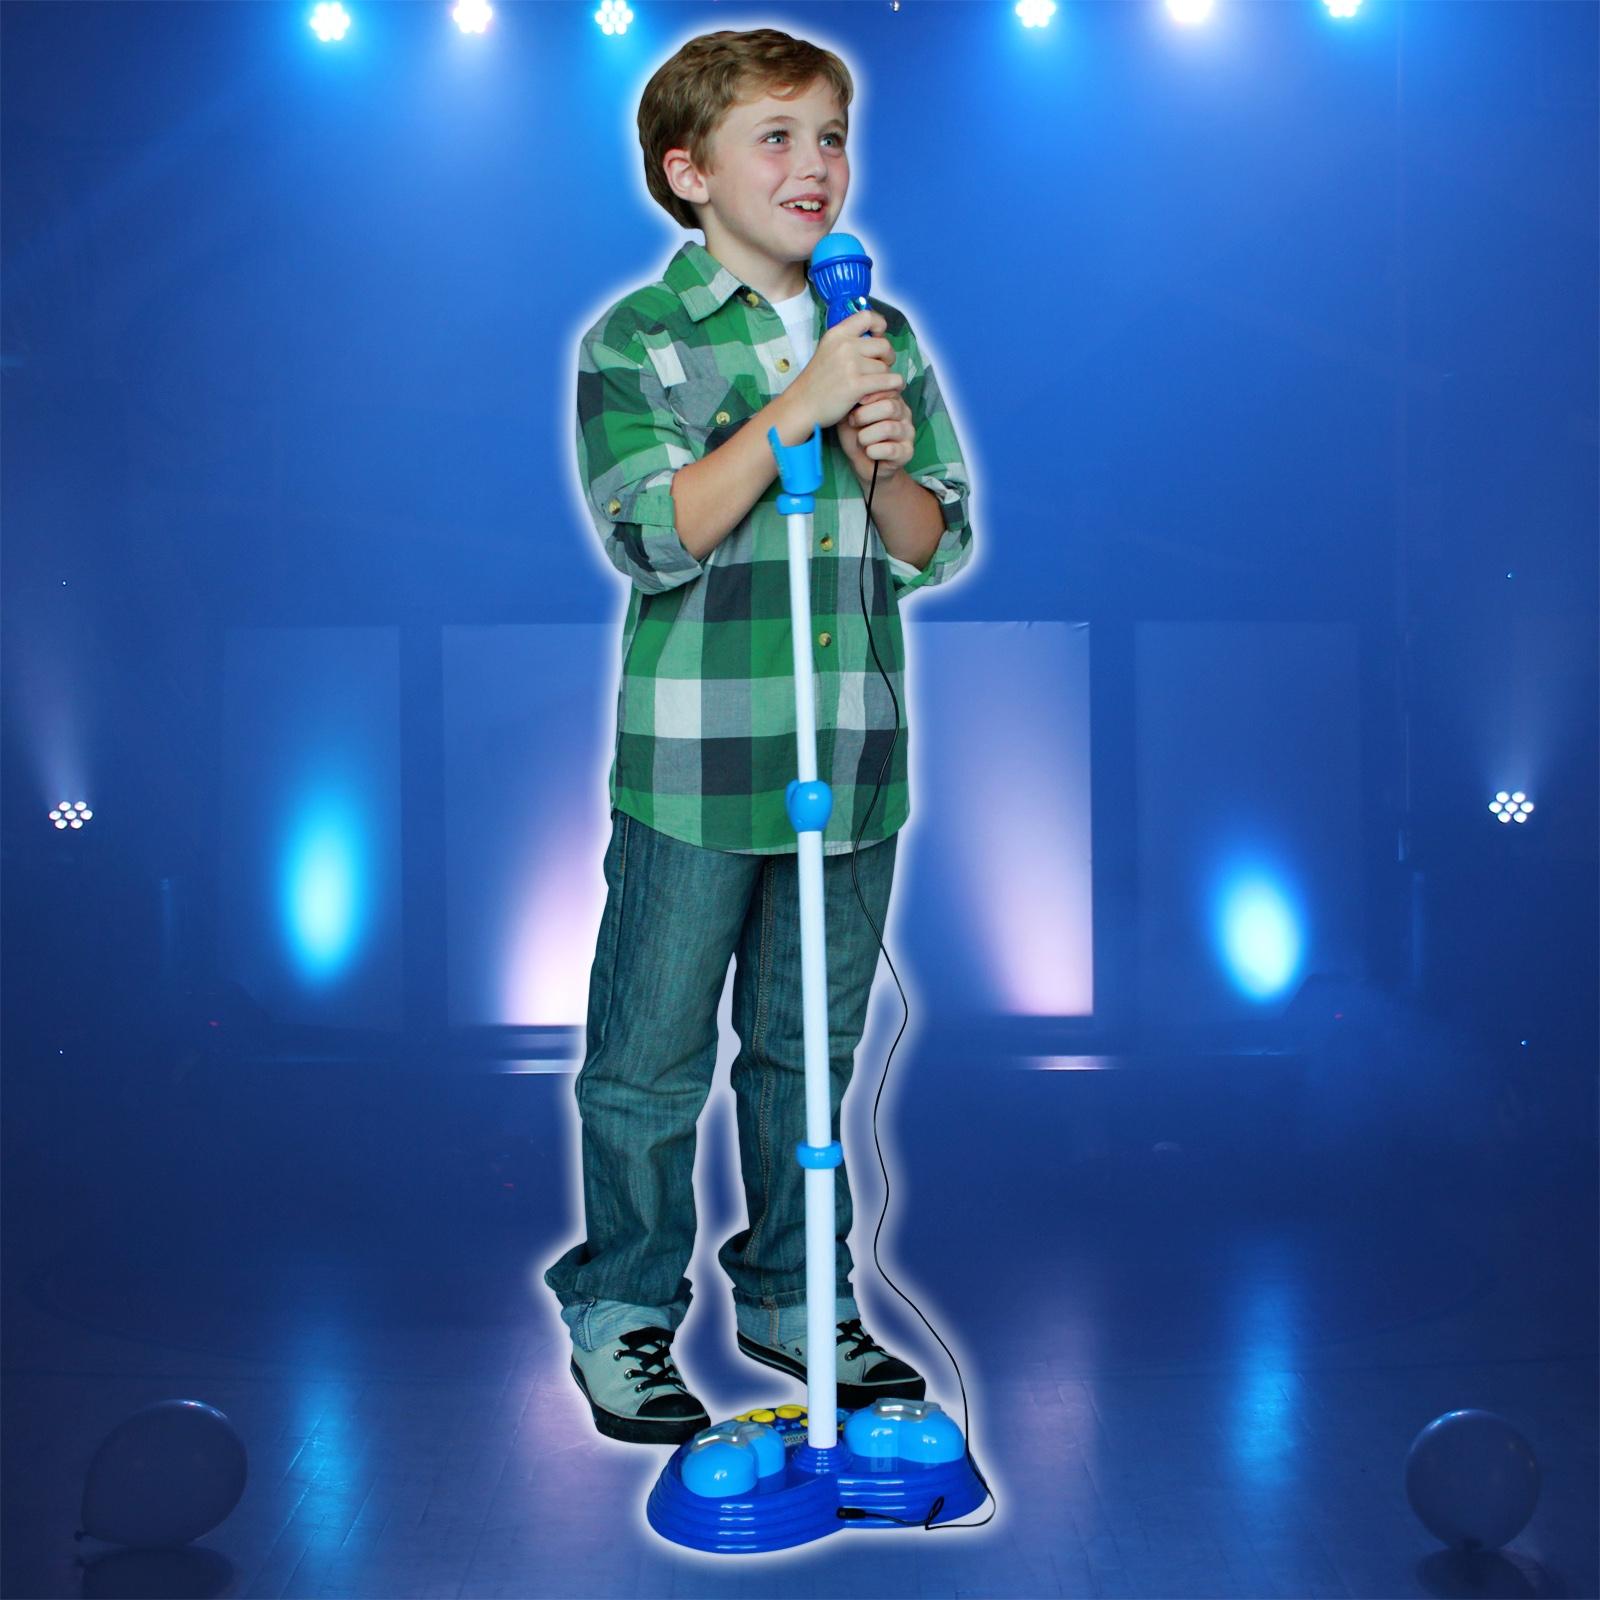 Kids Interactive Karaoke Singing Microphone Flashing Lights and Sound - Blue